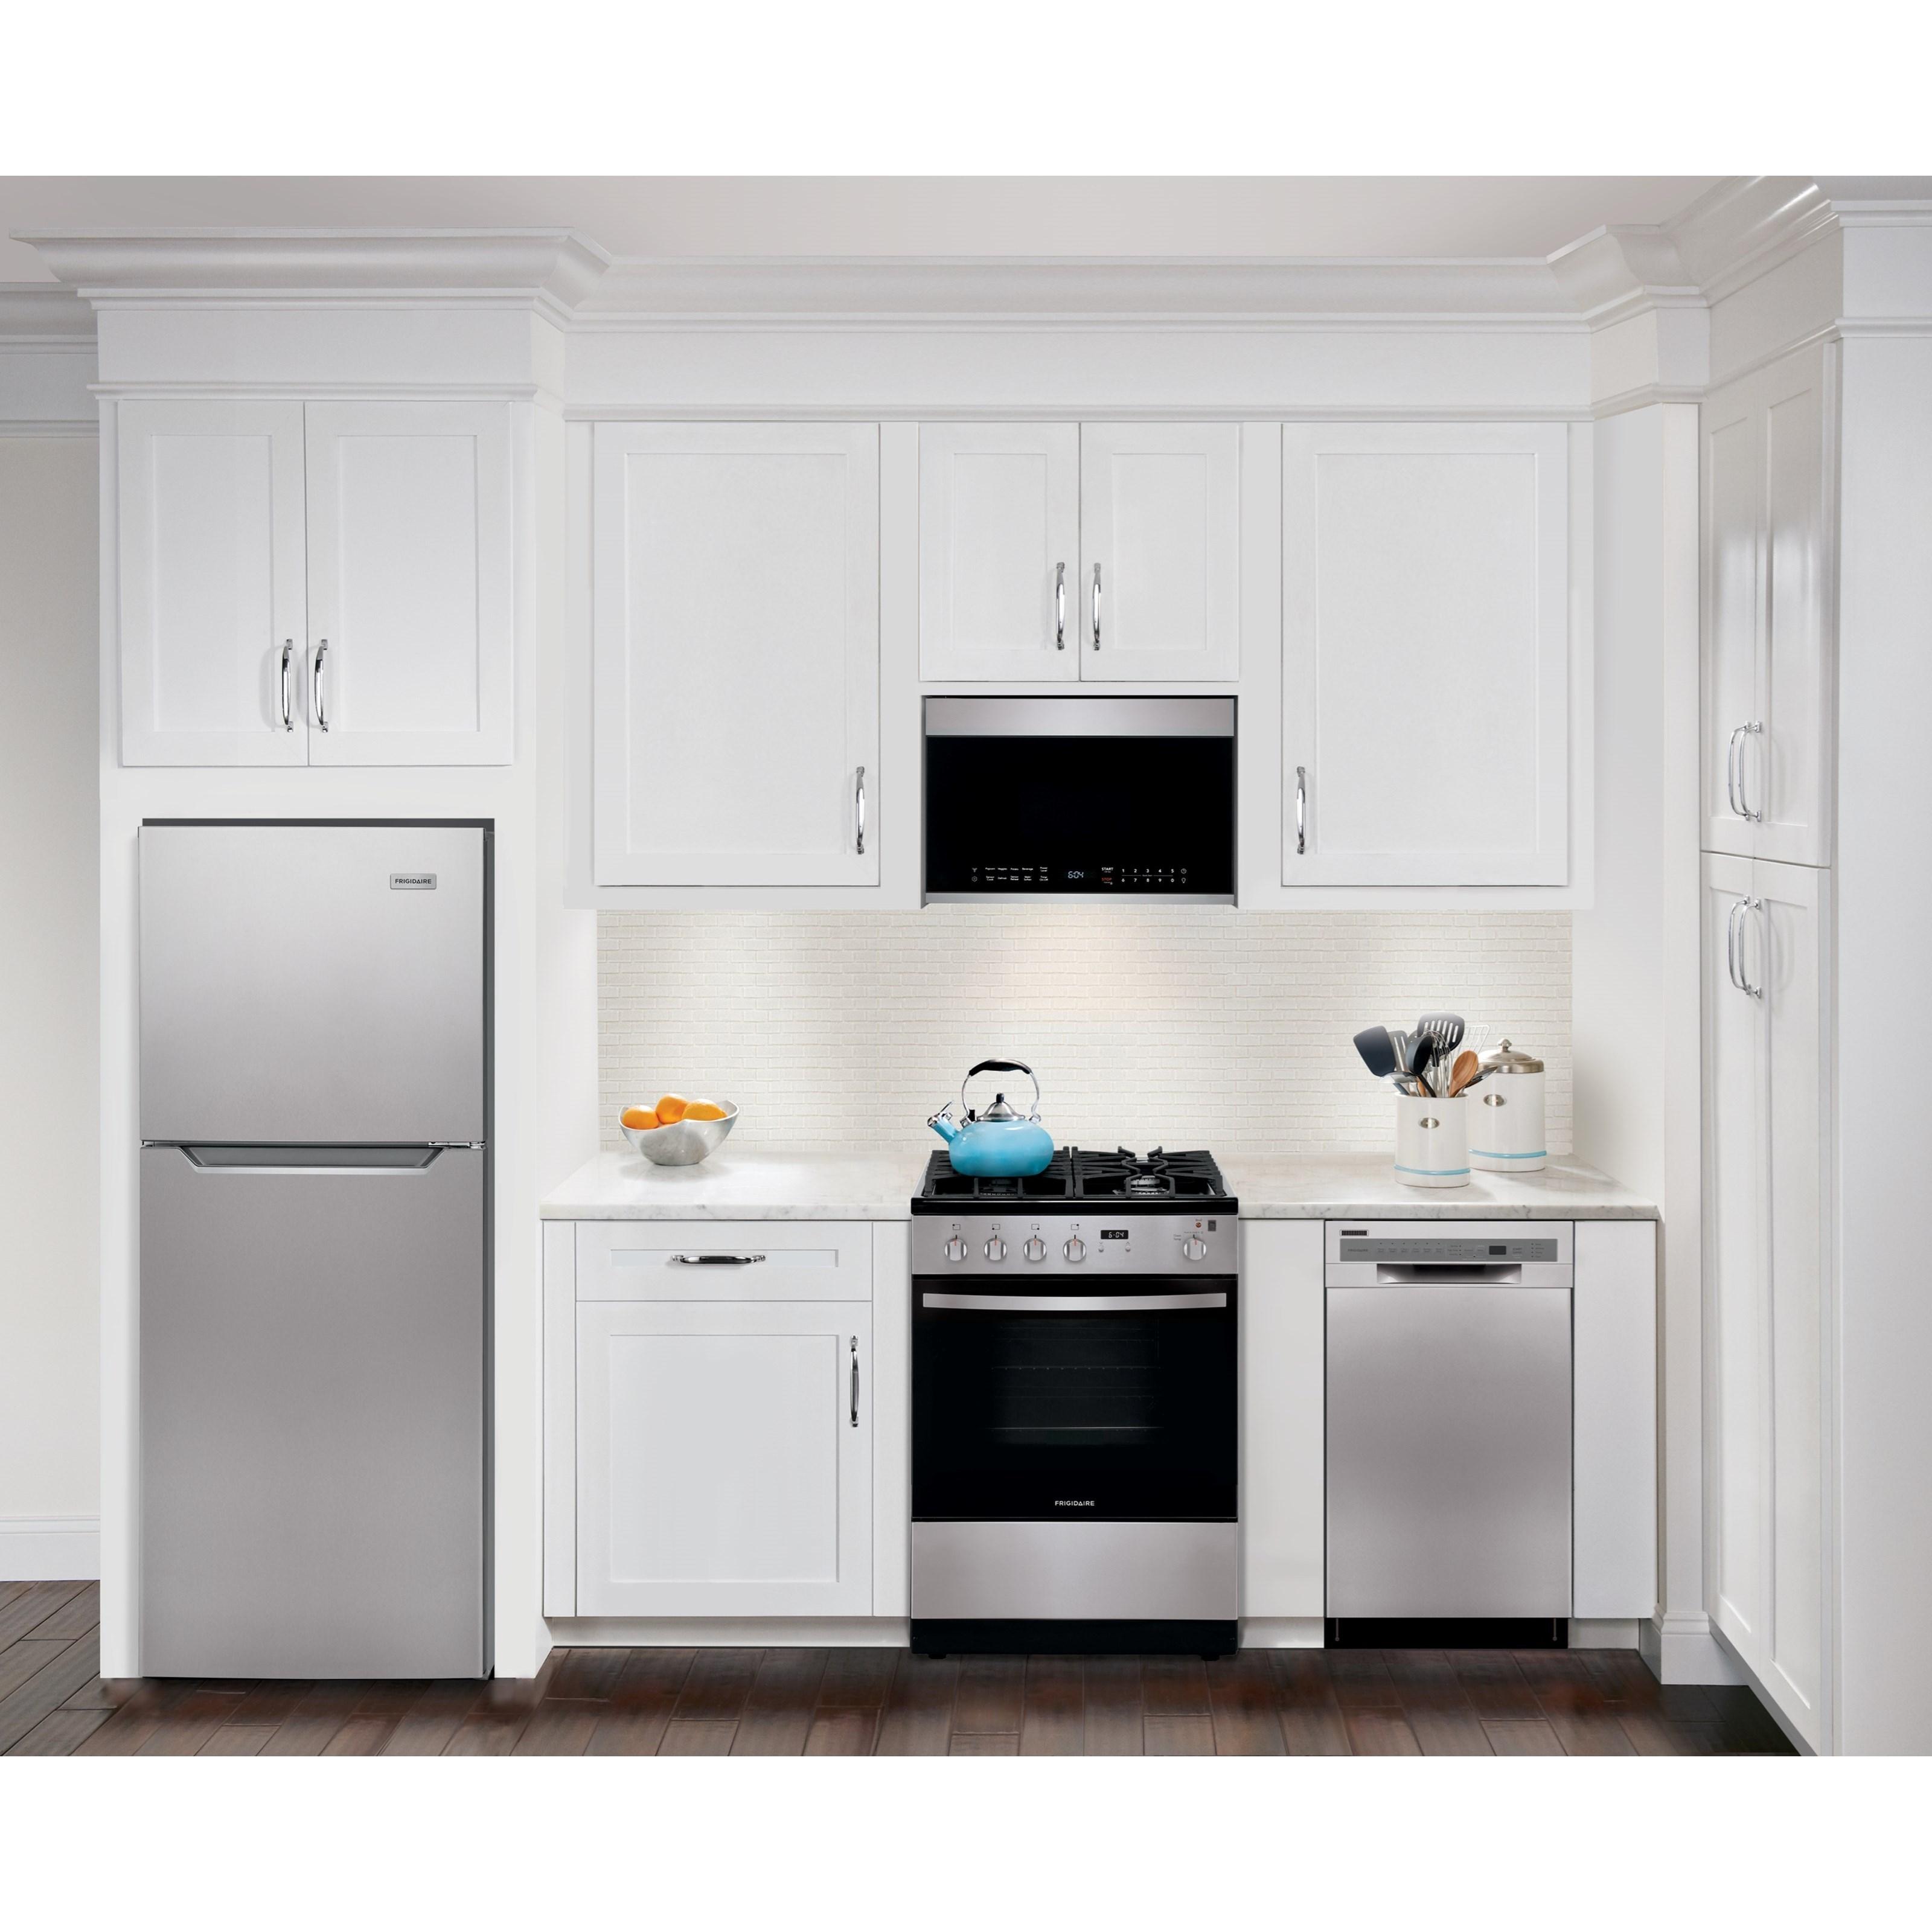 microwaves 1 4 cu ft over the range microwave